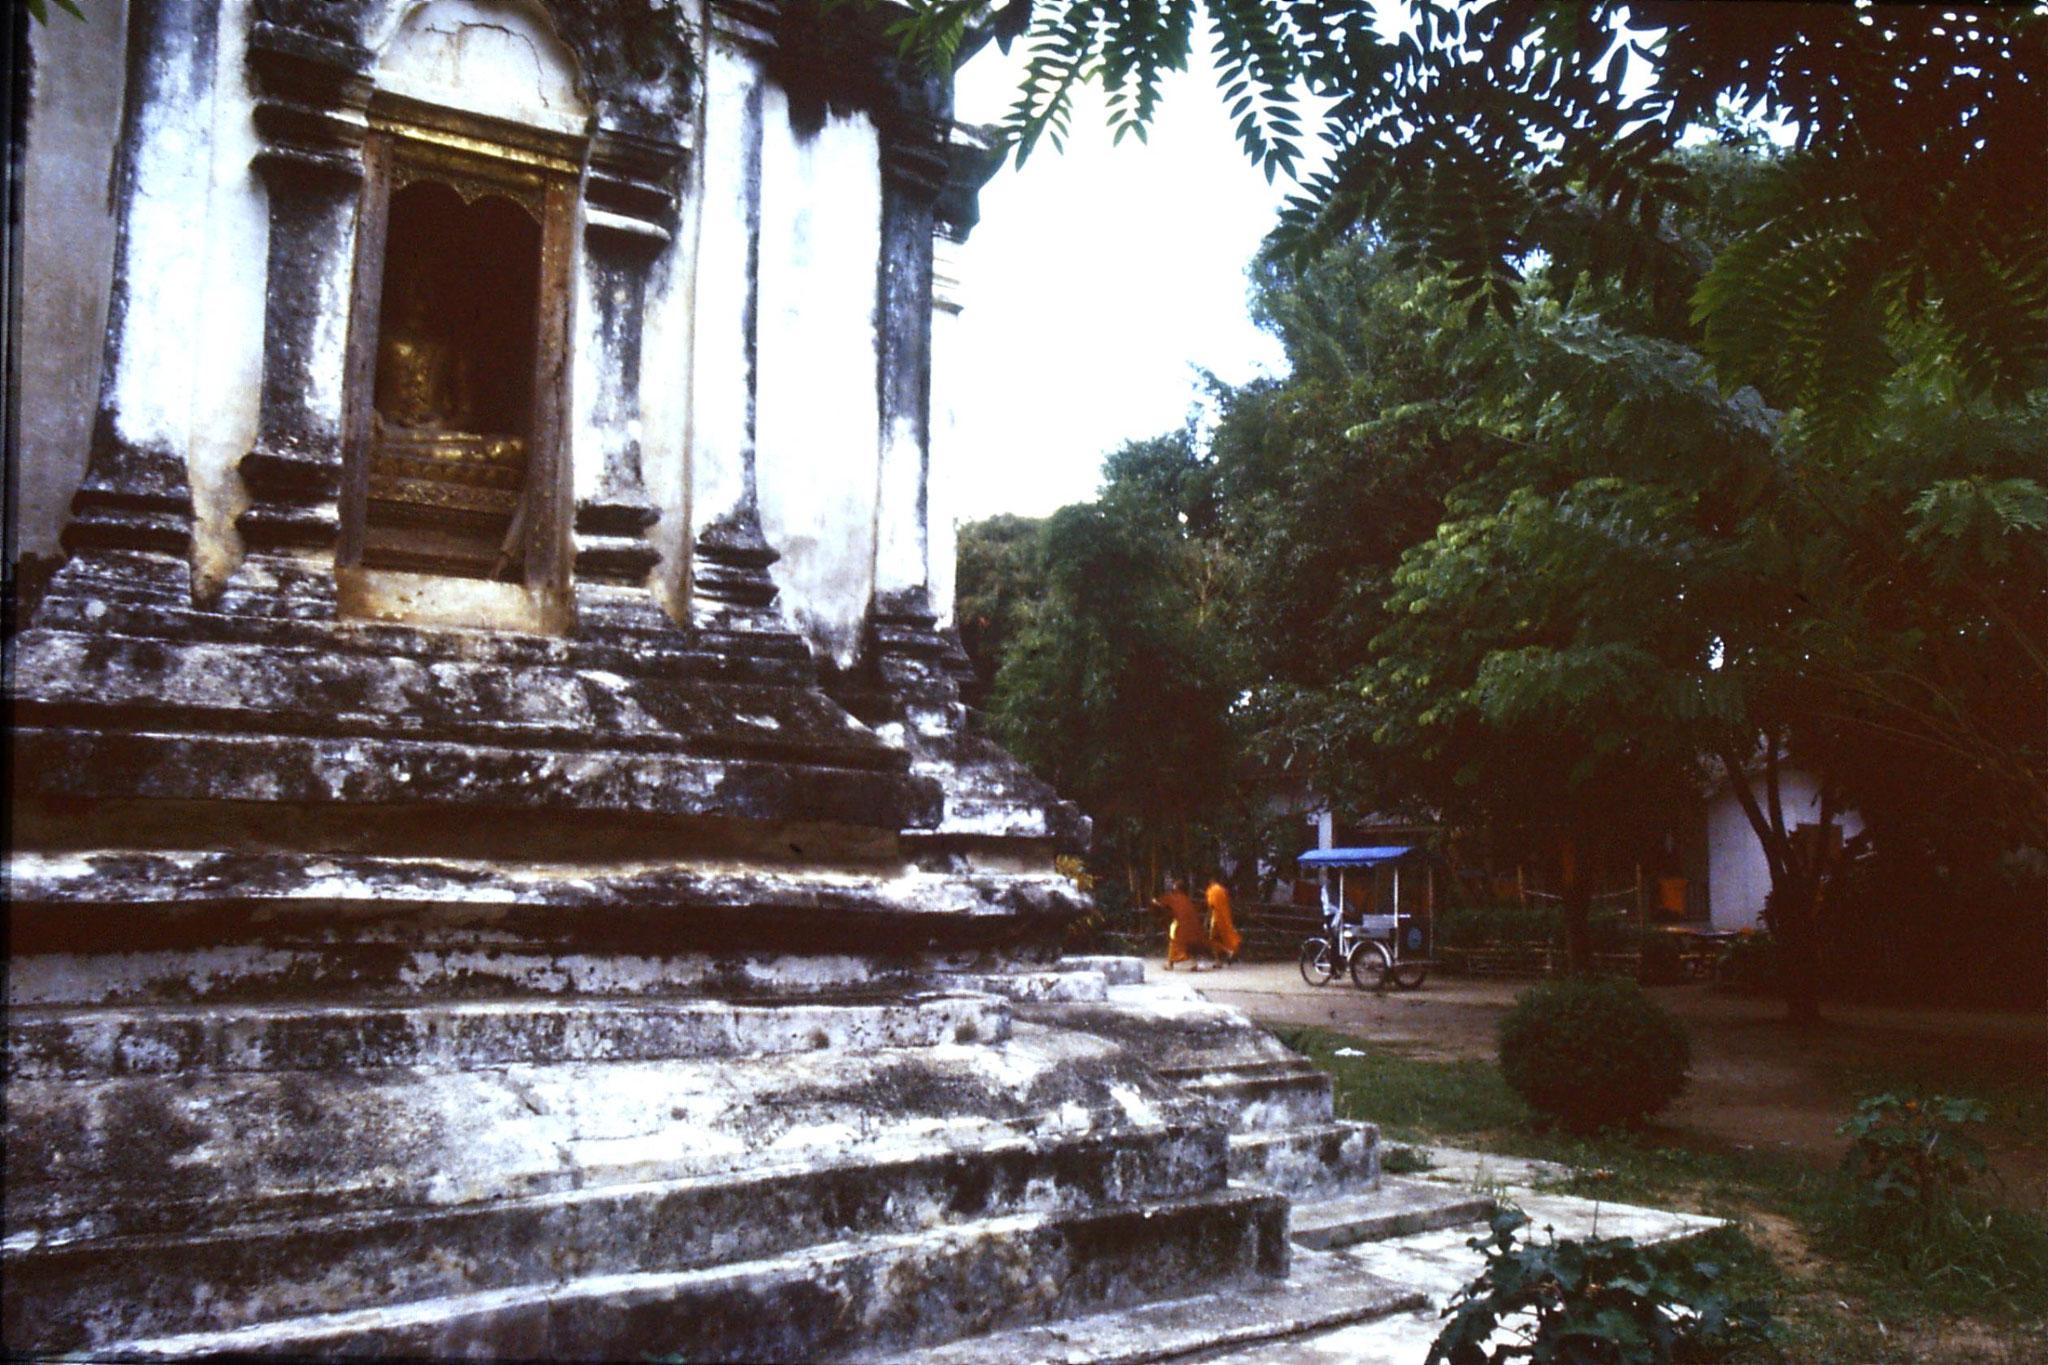 14/6/1990: 2: Chang Mai, Wat Phra Singh